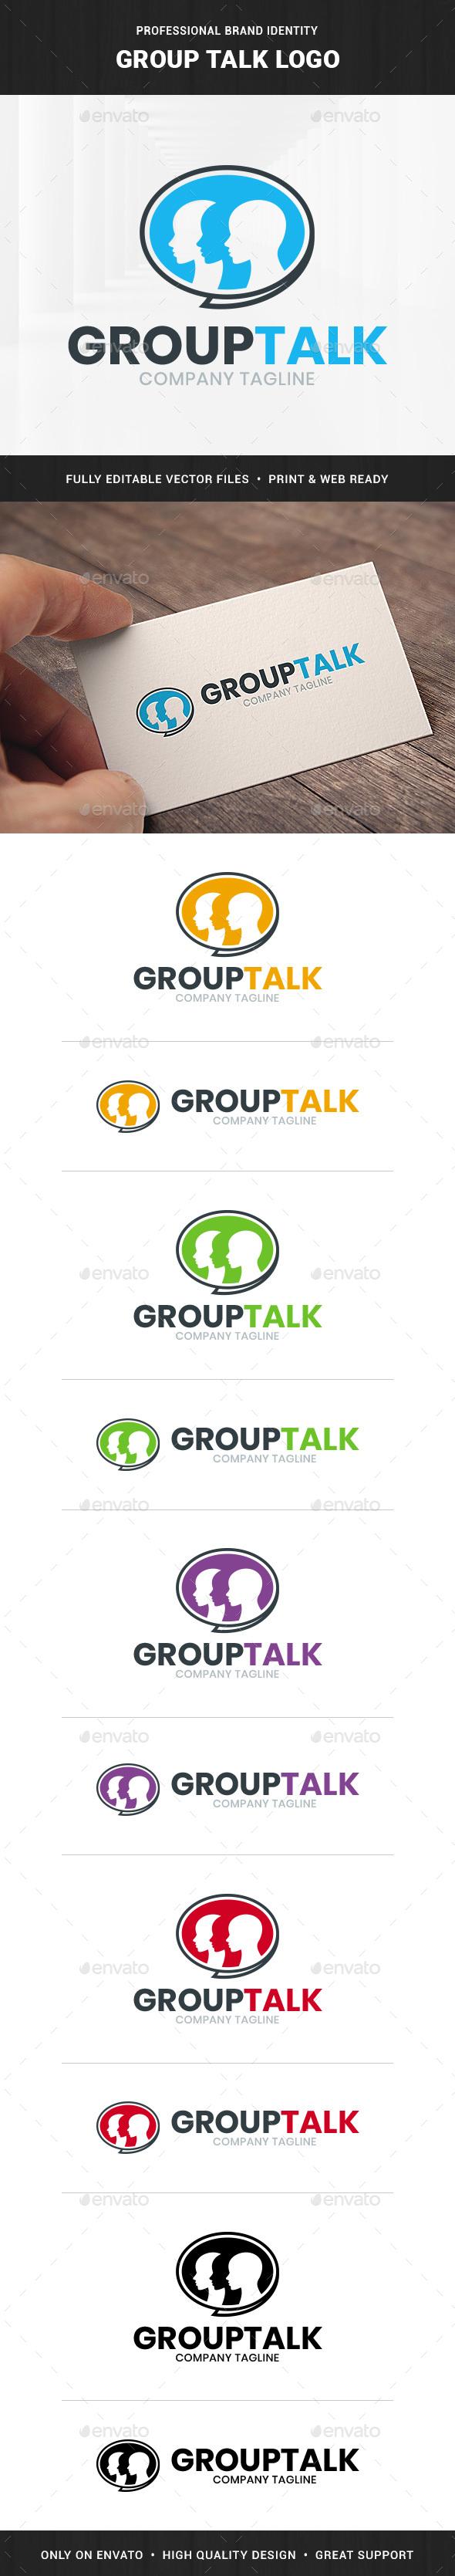 Group Talk Logo Template